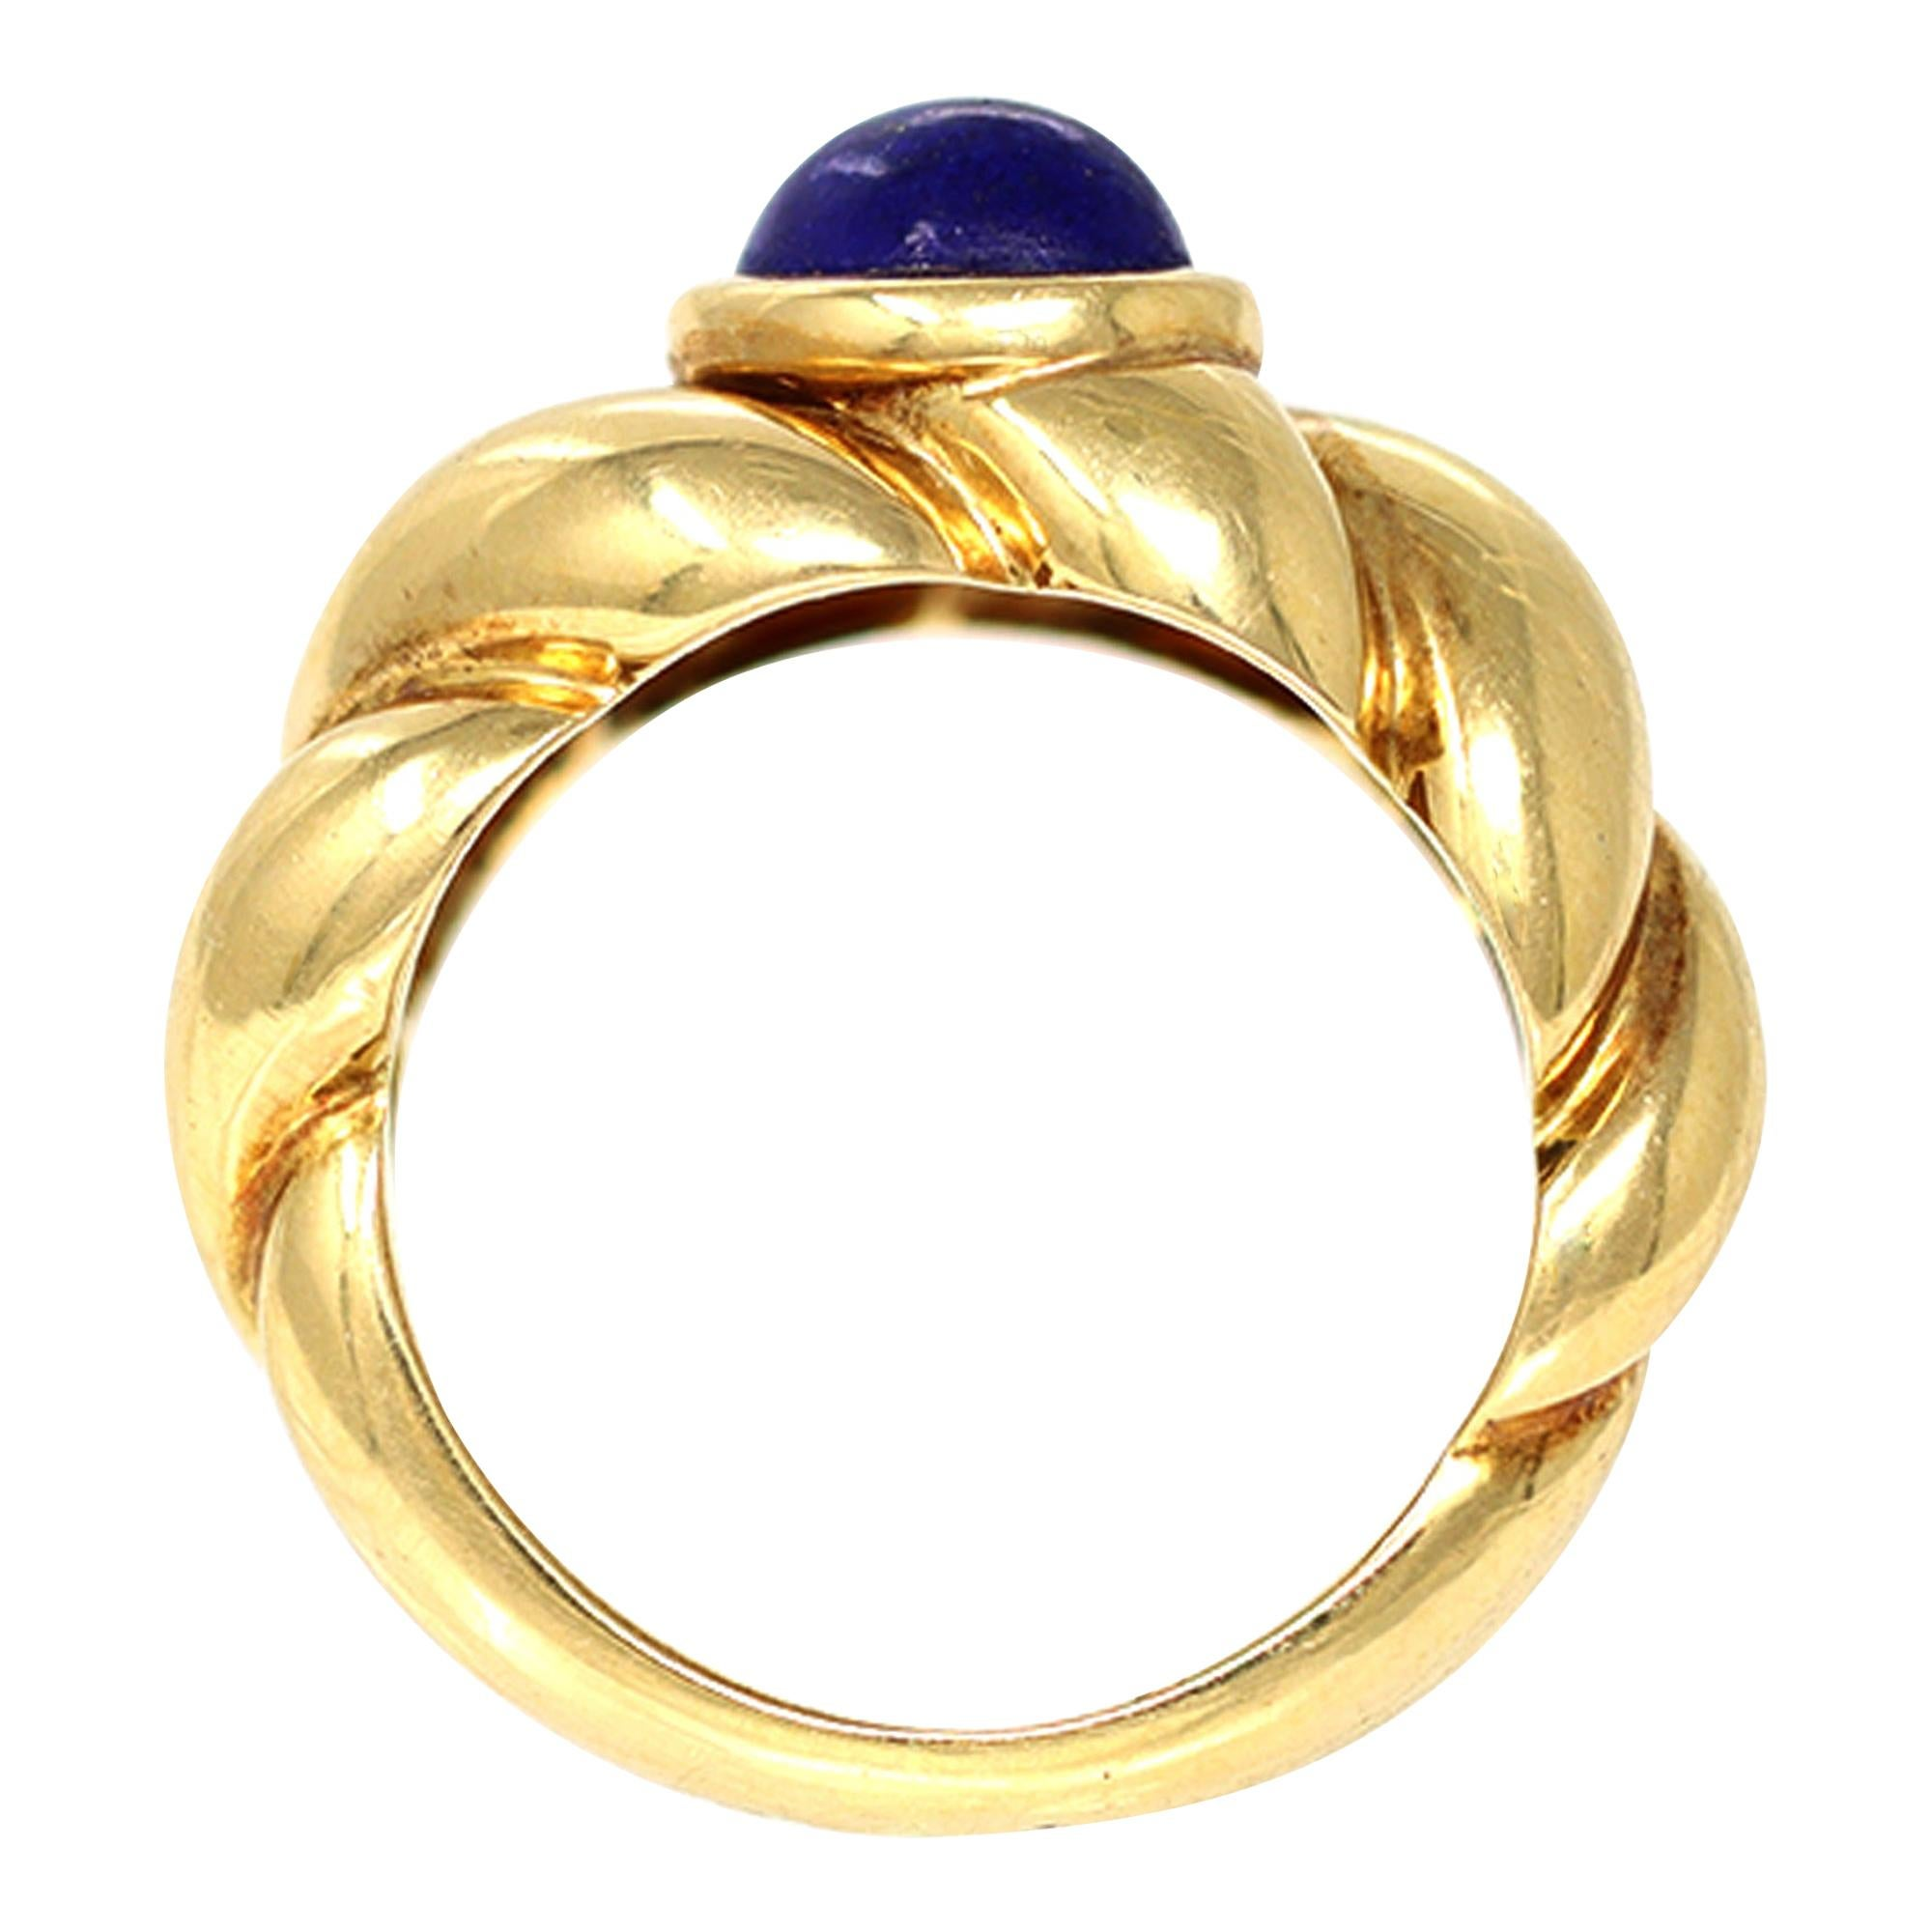 Van Cleef & Arpels Lapis Lazuli Cabochon Ring Set in 18k Yellow Gold